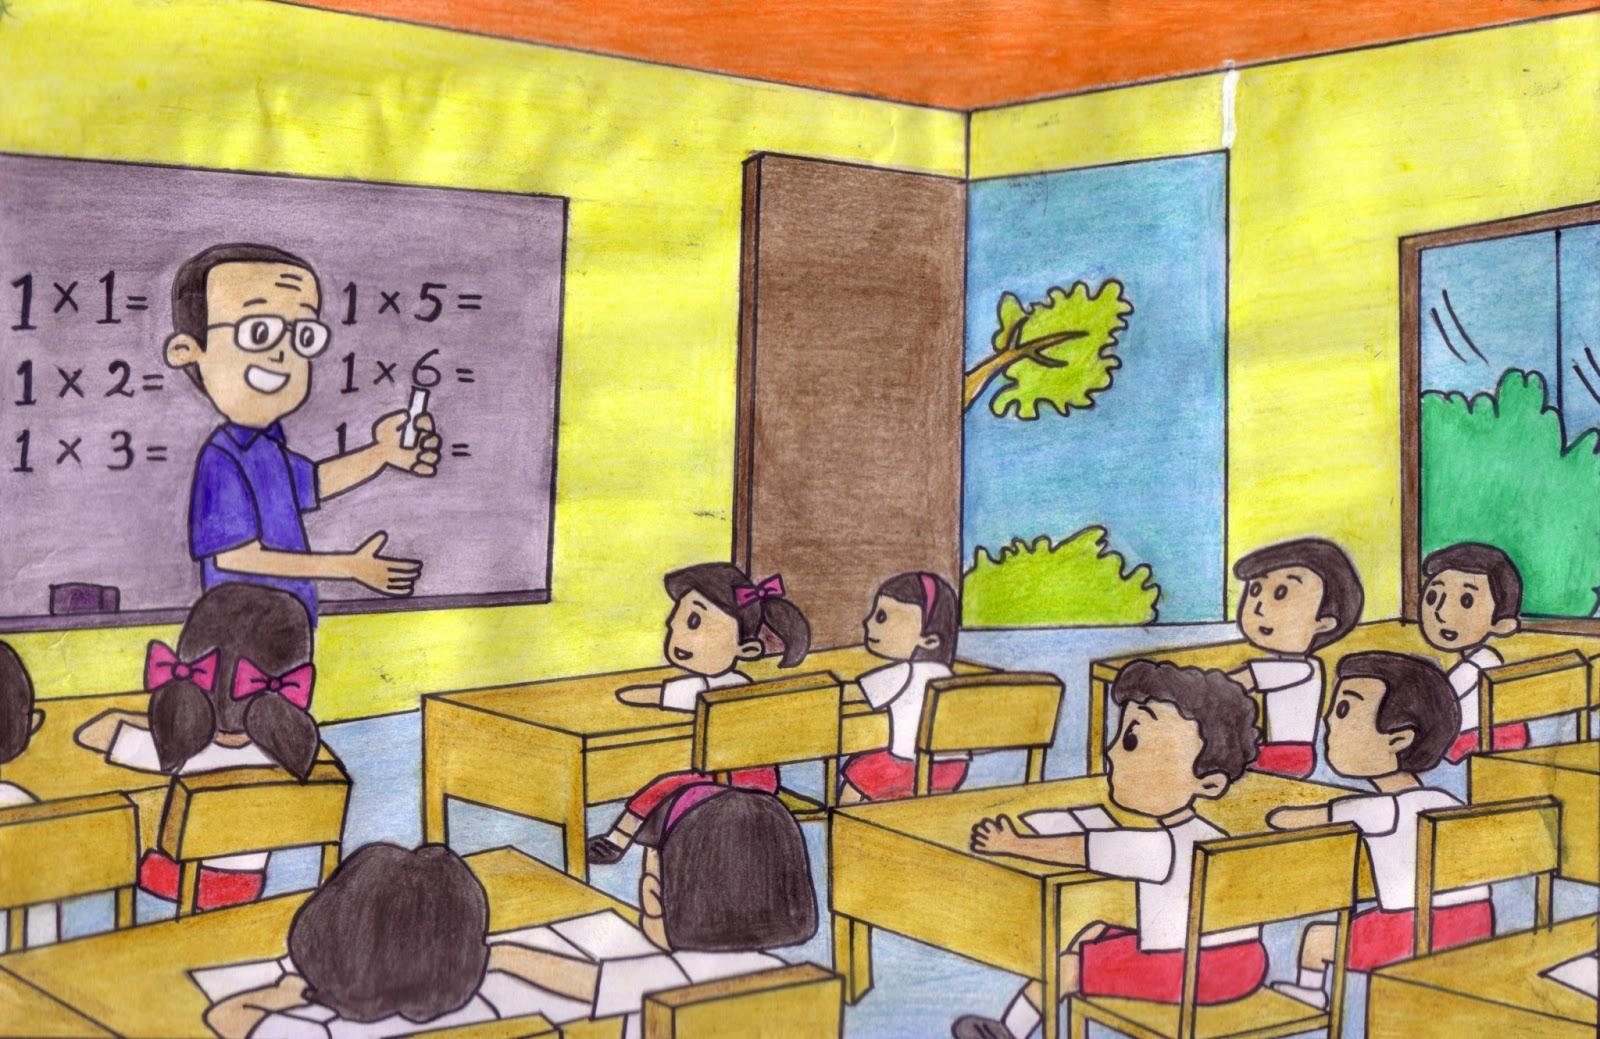 Kumpulan Gambar Kartun Bu Guru Sedang Mengajar Galeri Kartun